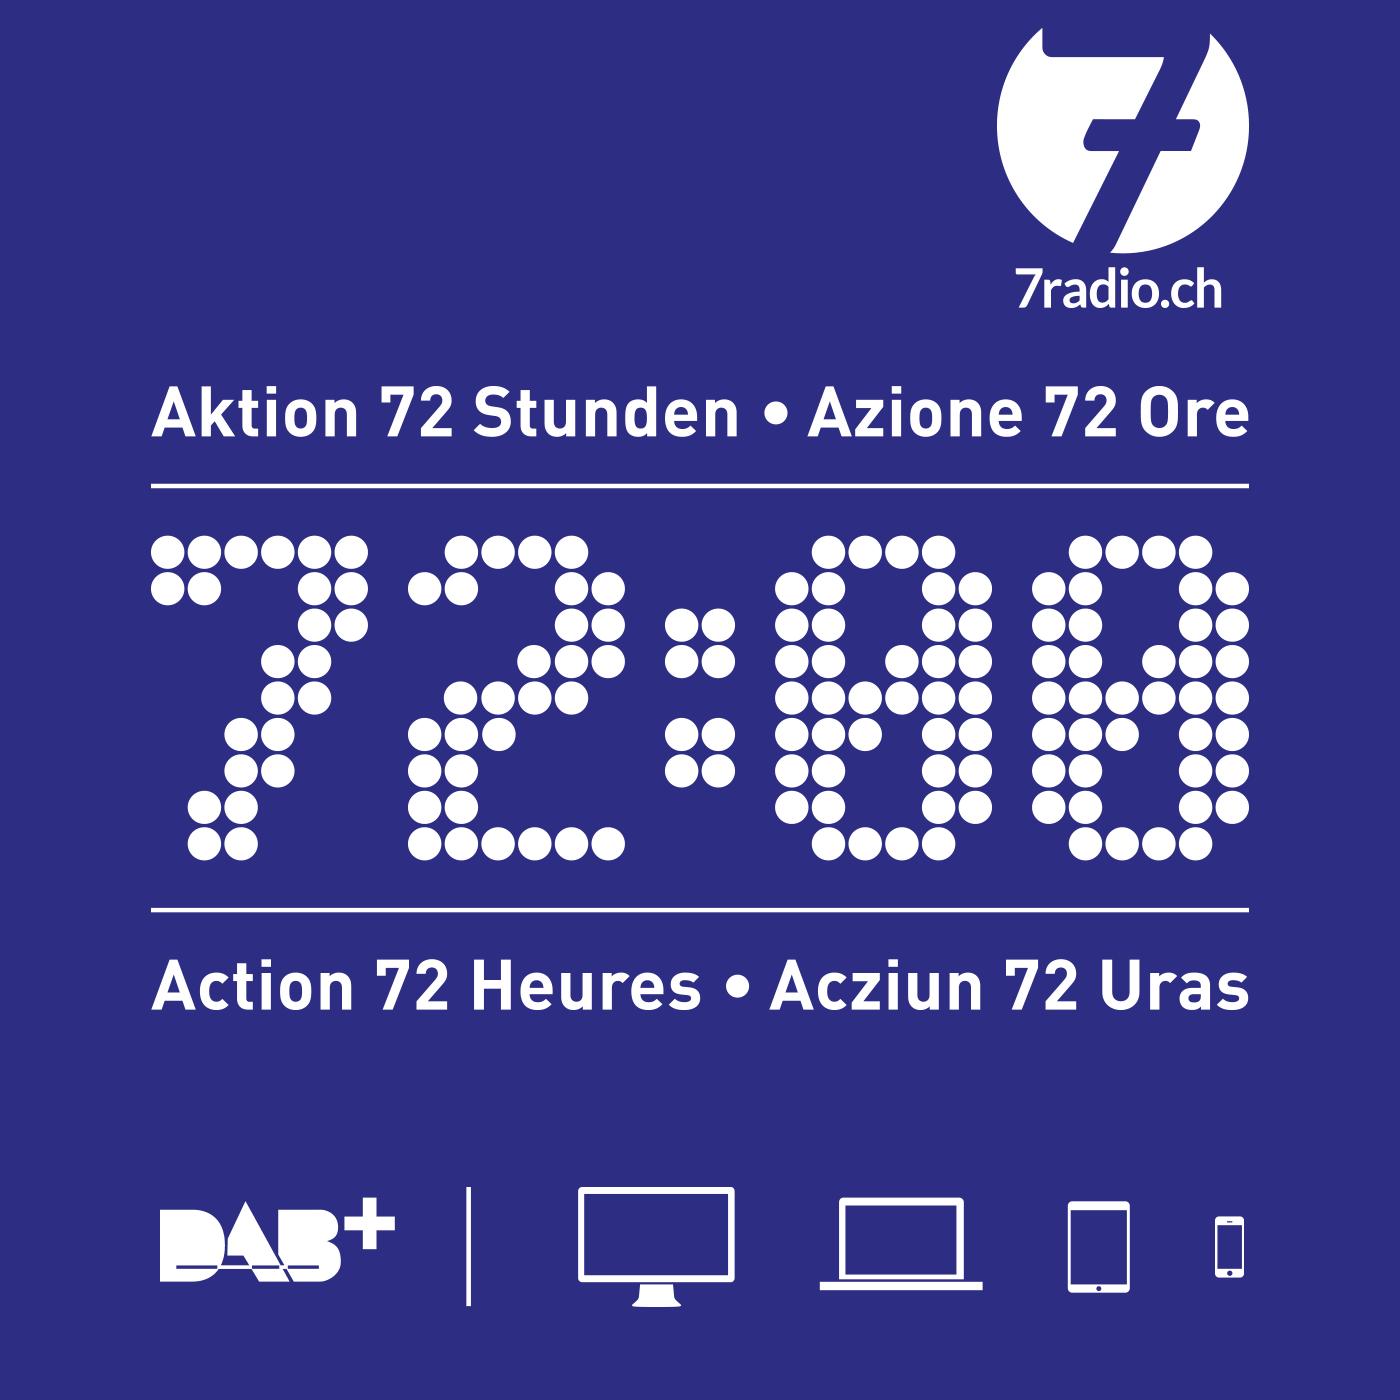 7radio | 72 heures de direct non-stop